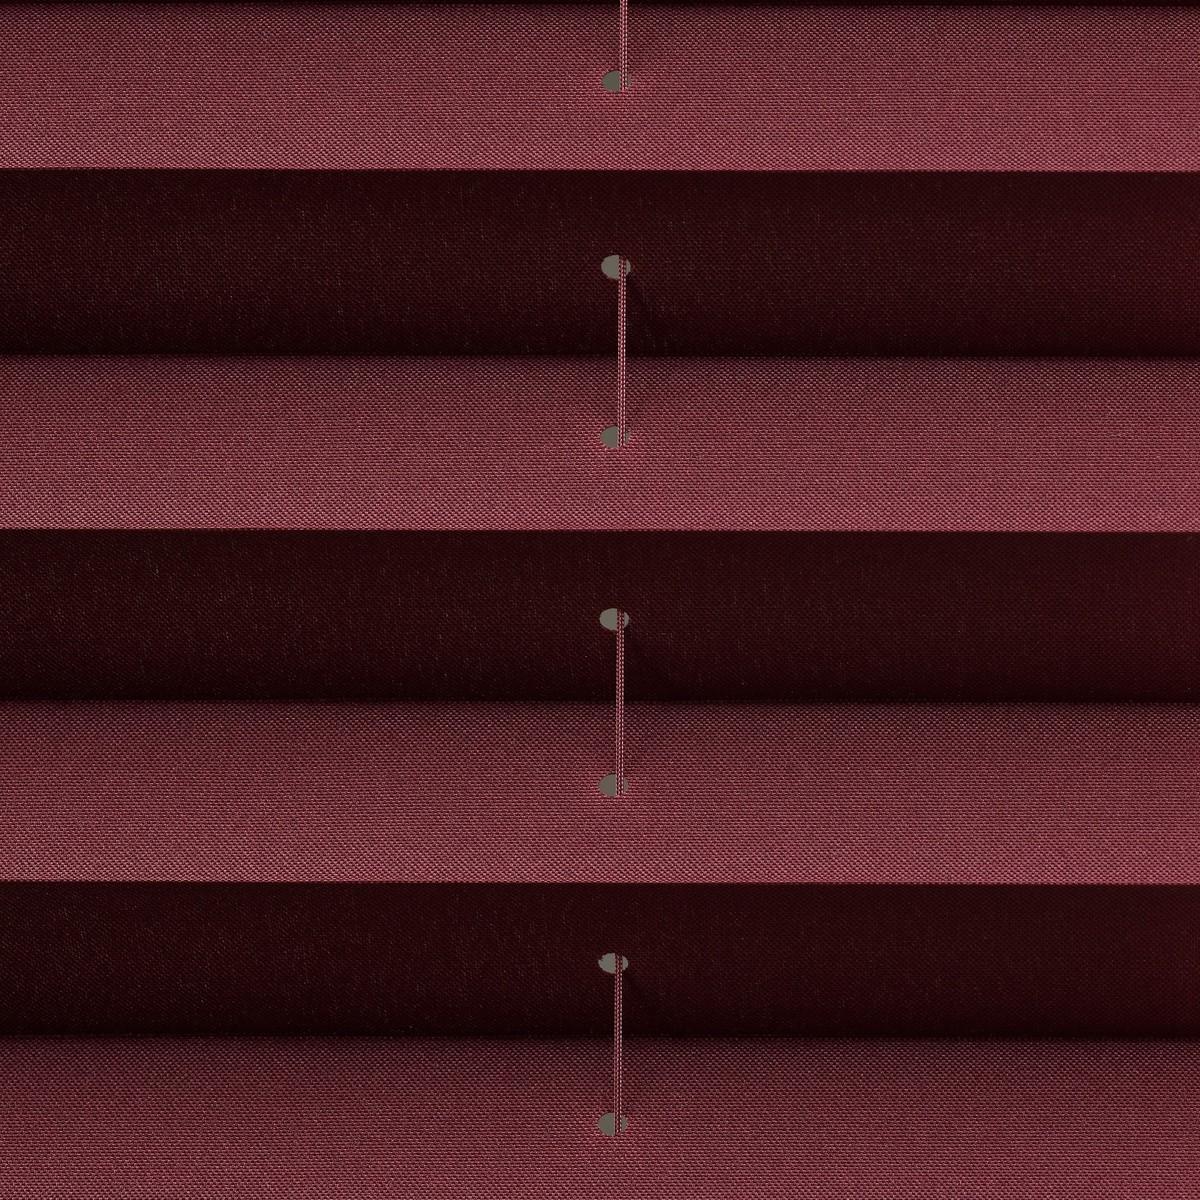 Bild 4 von Powertec Klemmfix-Plissee, ca. 130 x 80 cm, bordeaux